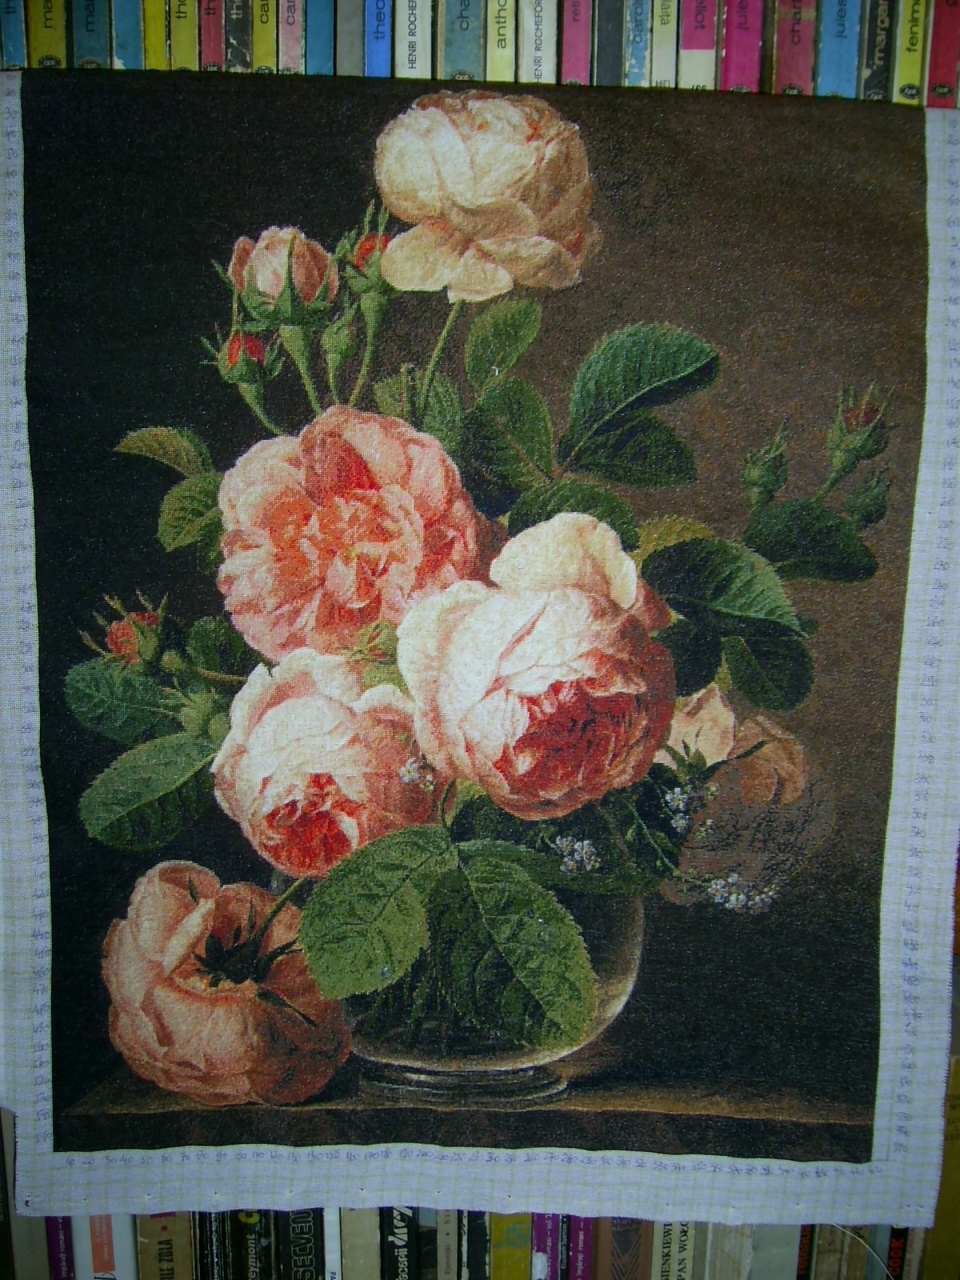 Anasstasia - goblen galerie - Pagina 20 PIC_0002